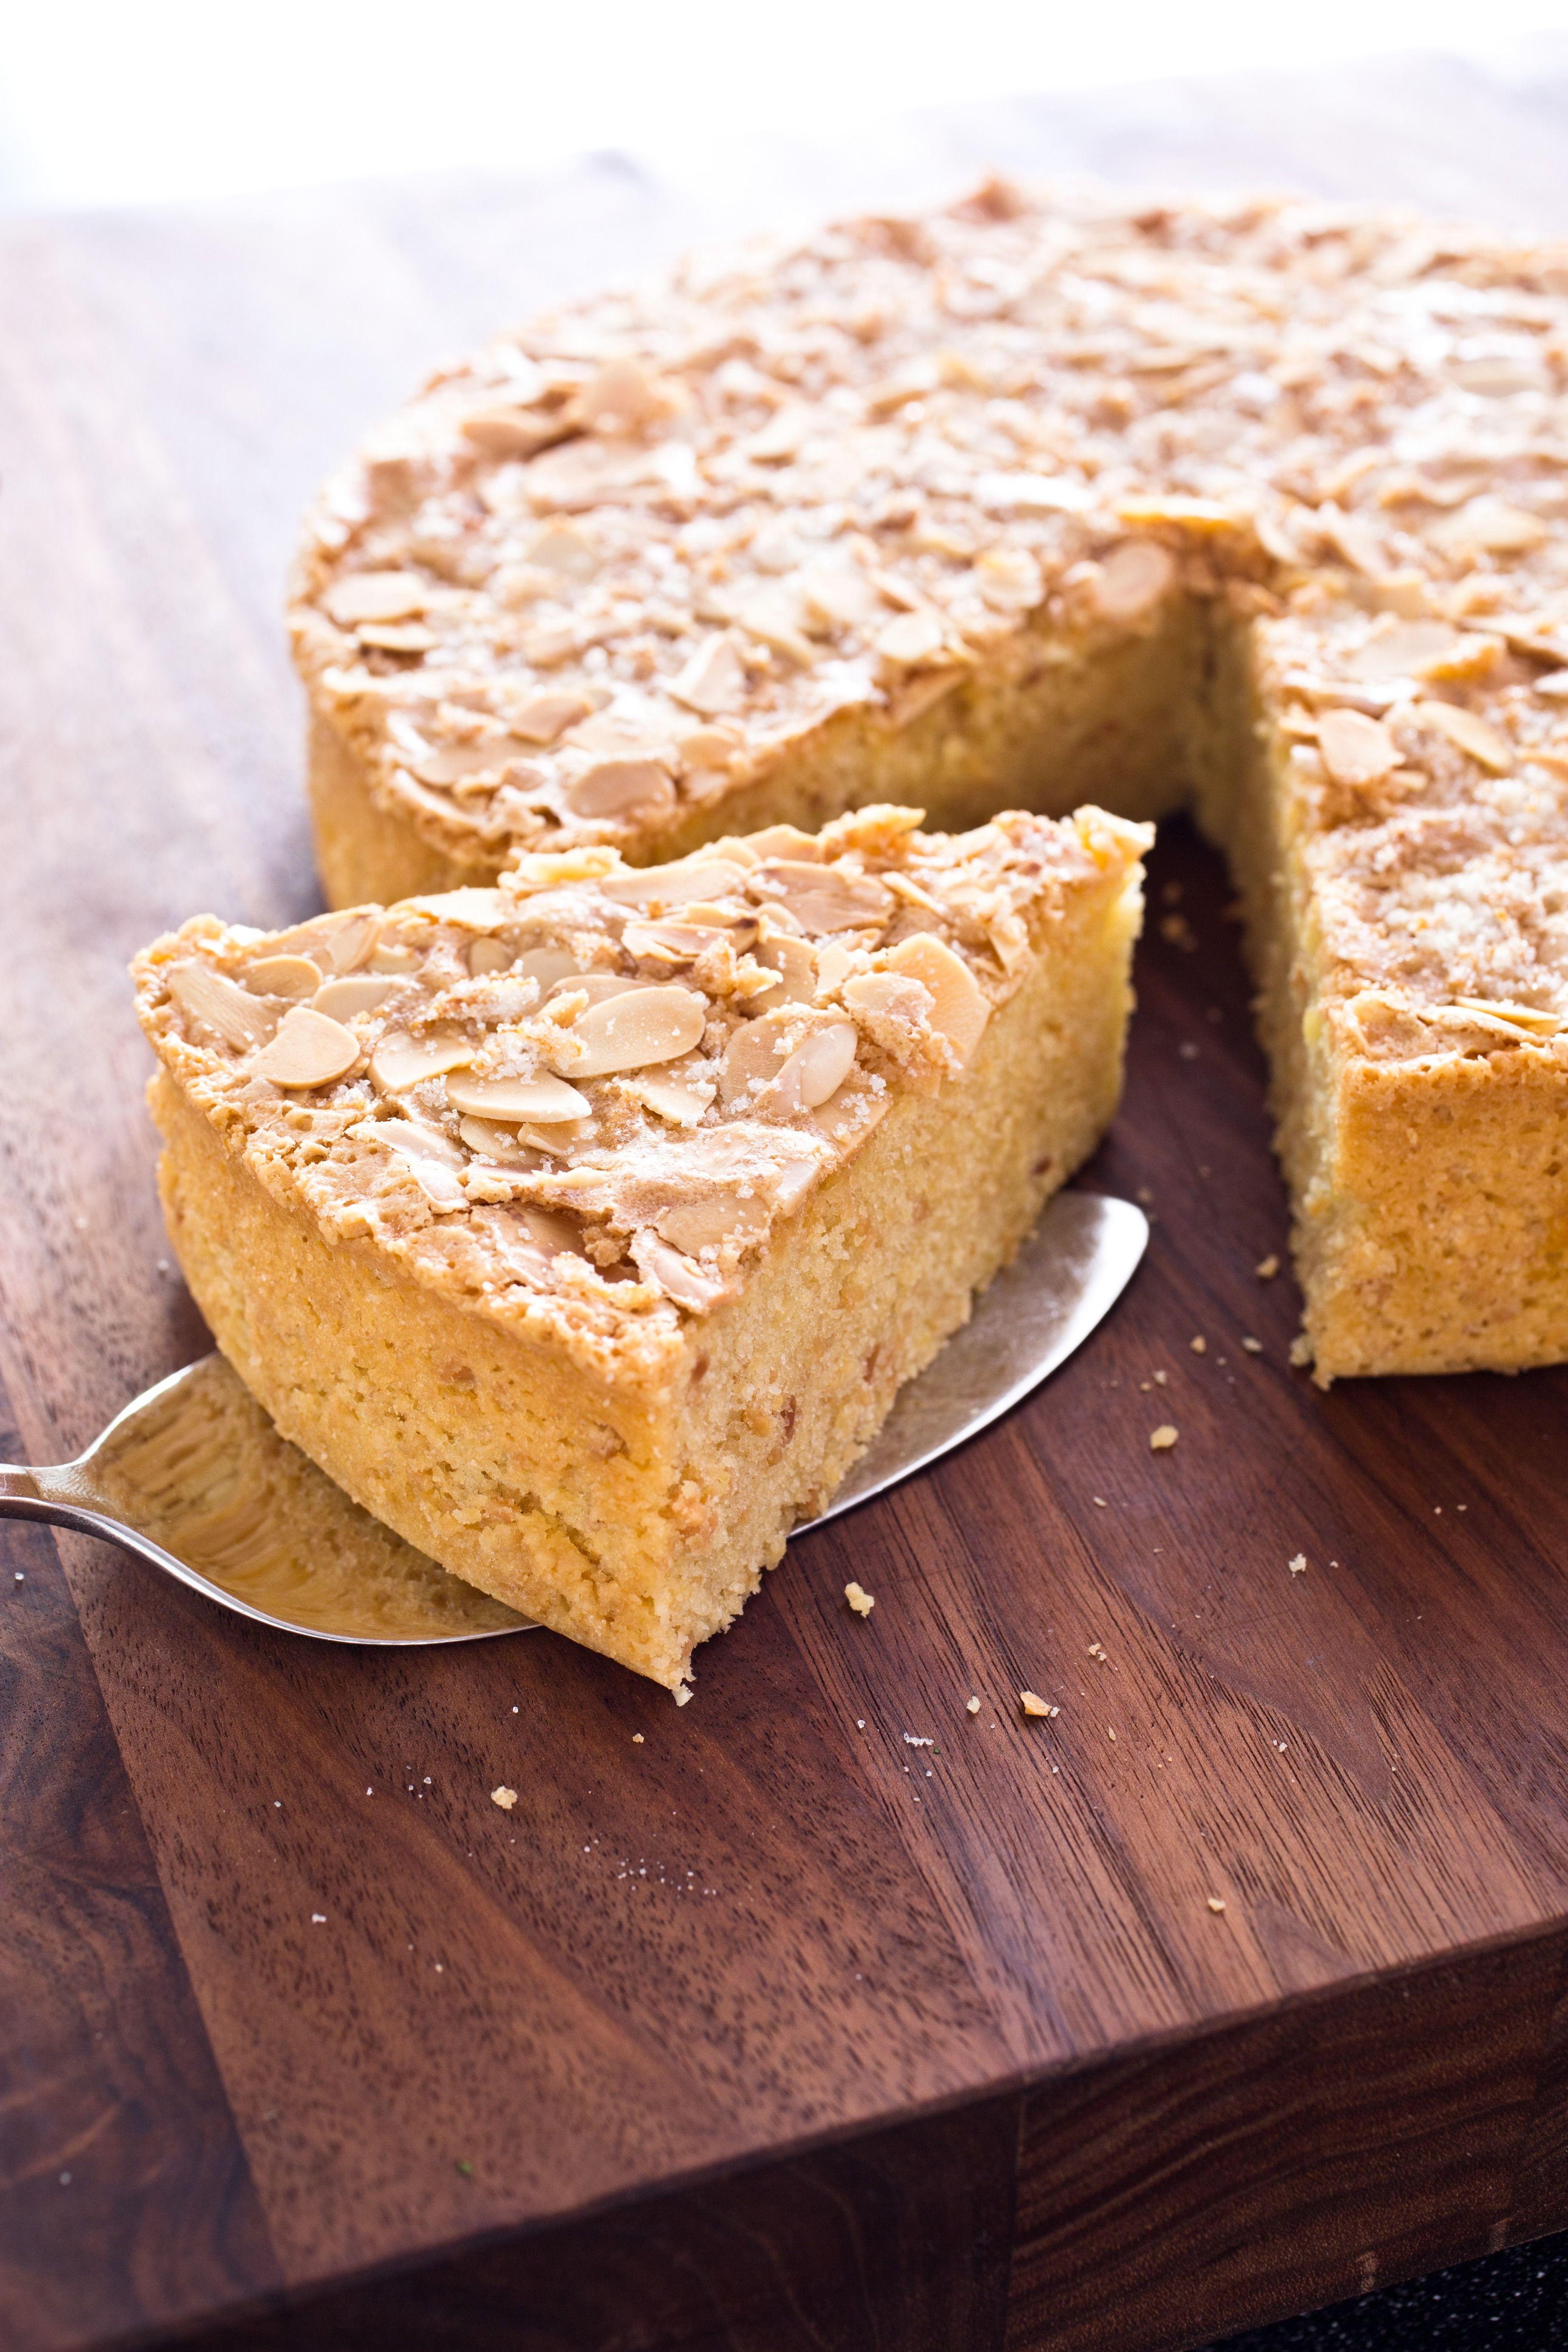 Italian Almond Cake From America's Test Kitchen